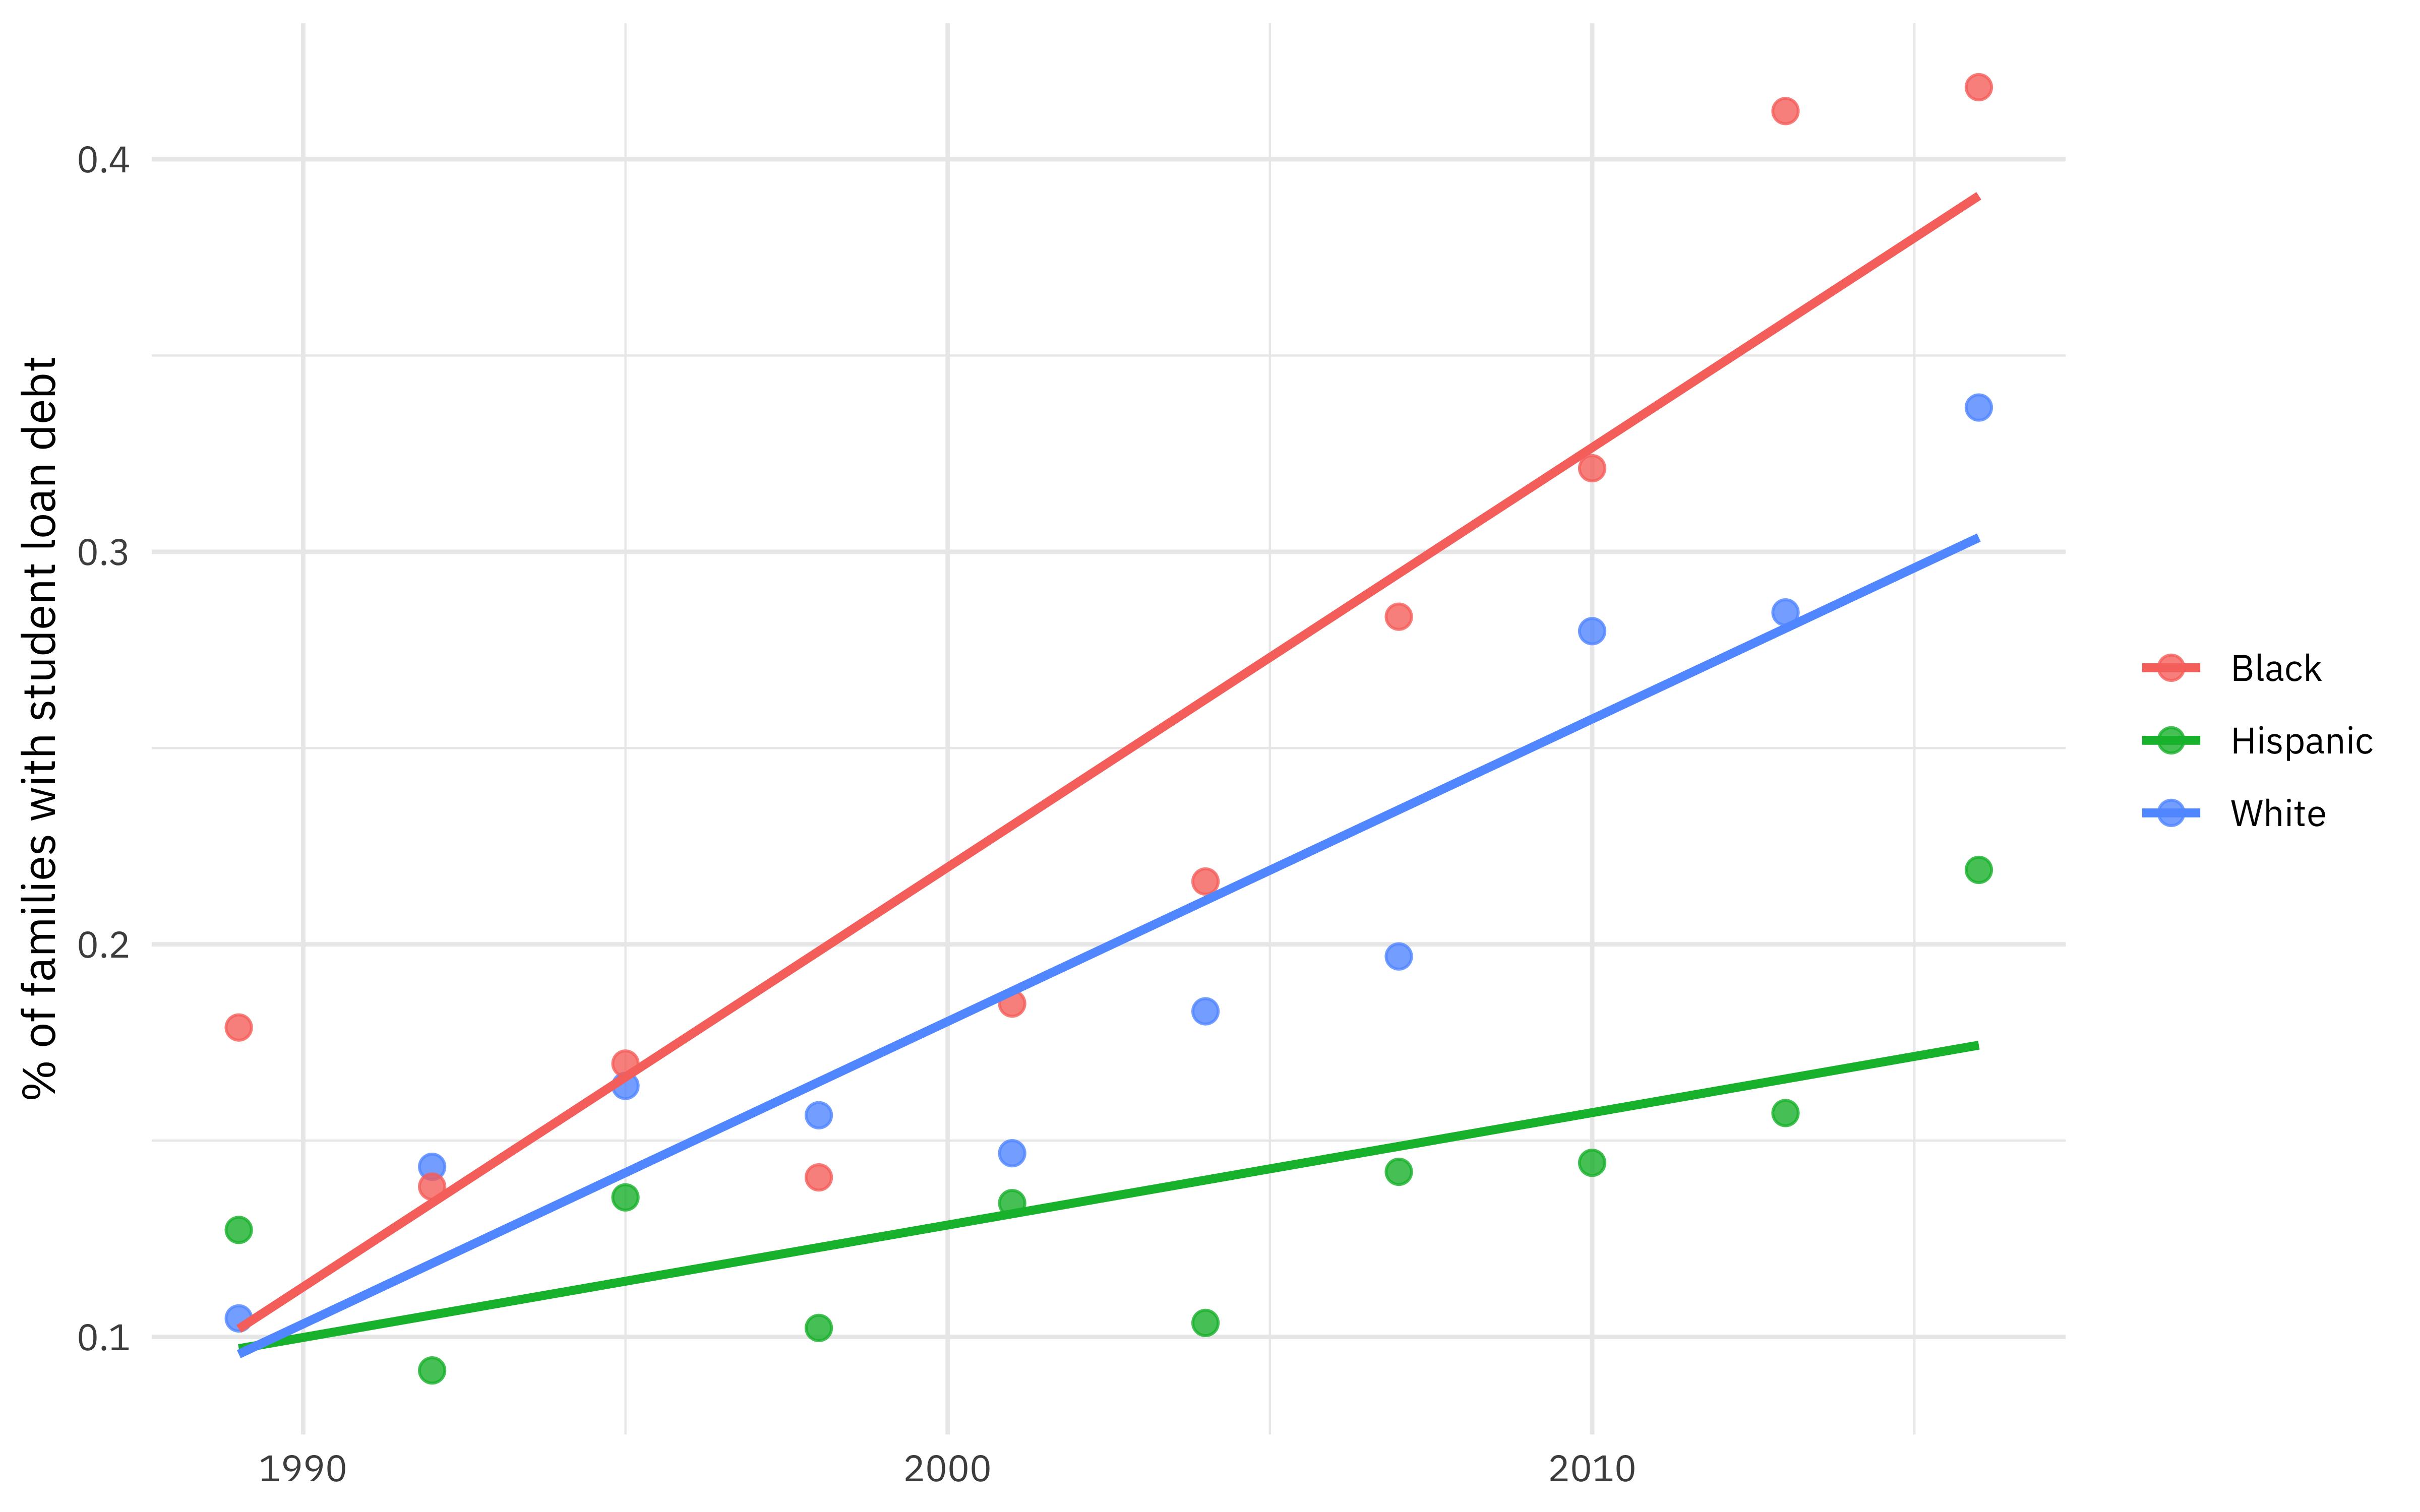 Plot showing student loan debt by race across time